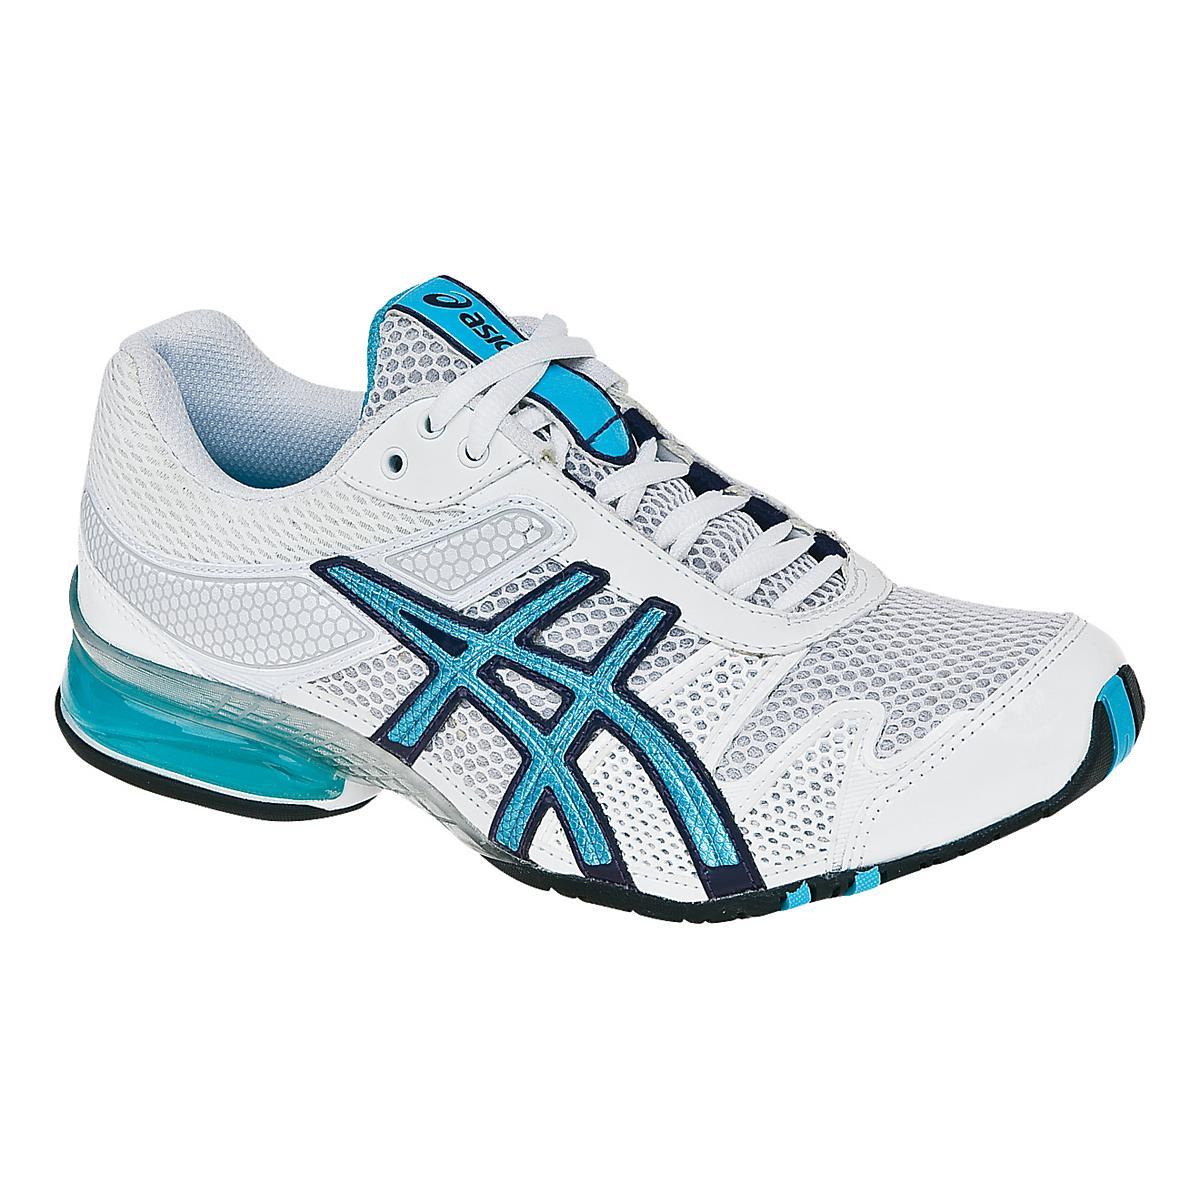 Asics Gel Plexus Cross Training Shoes For Women